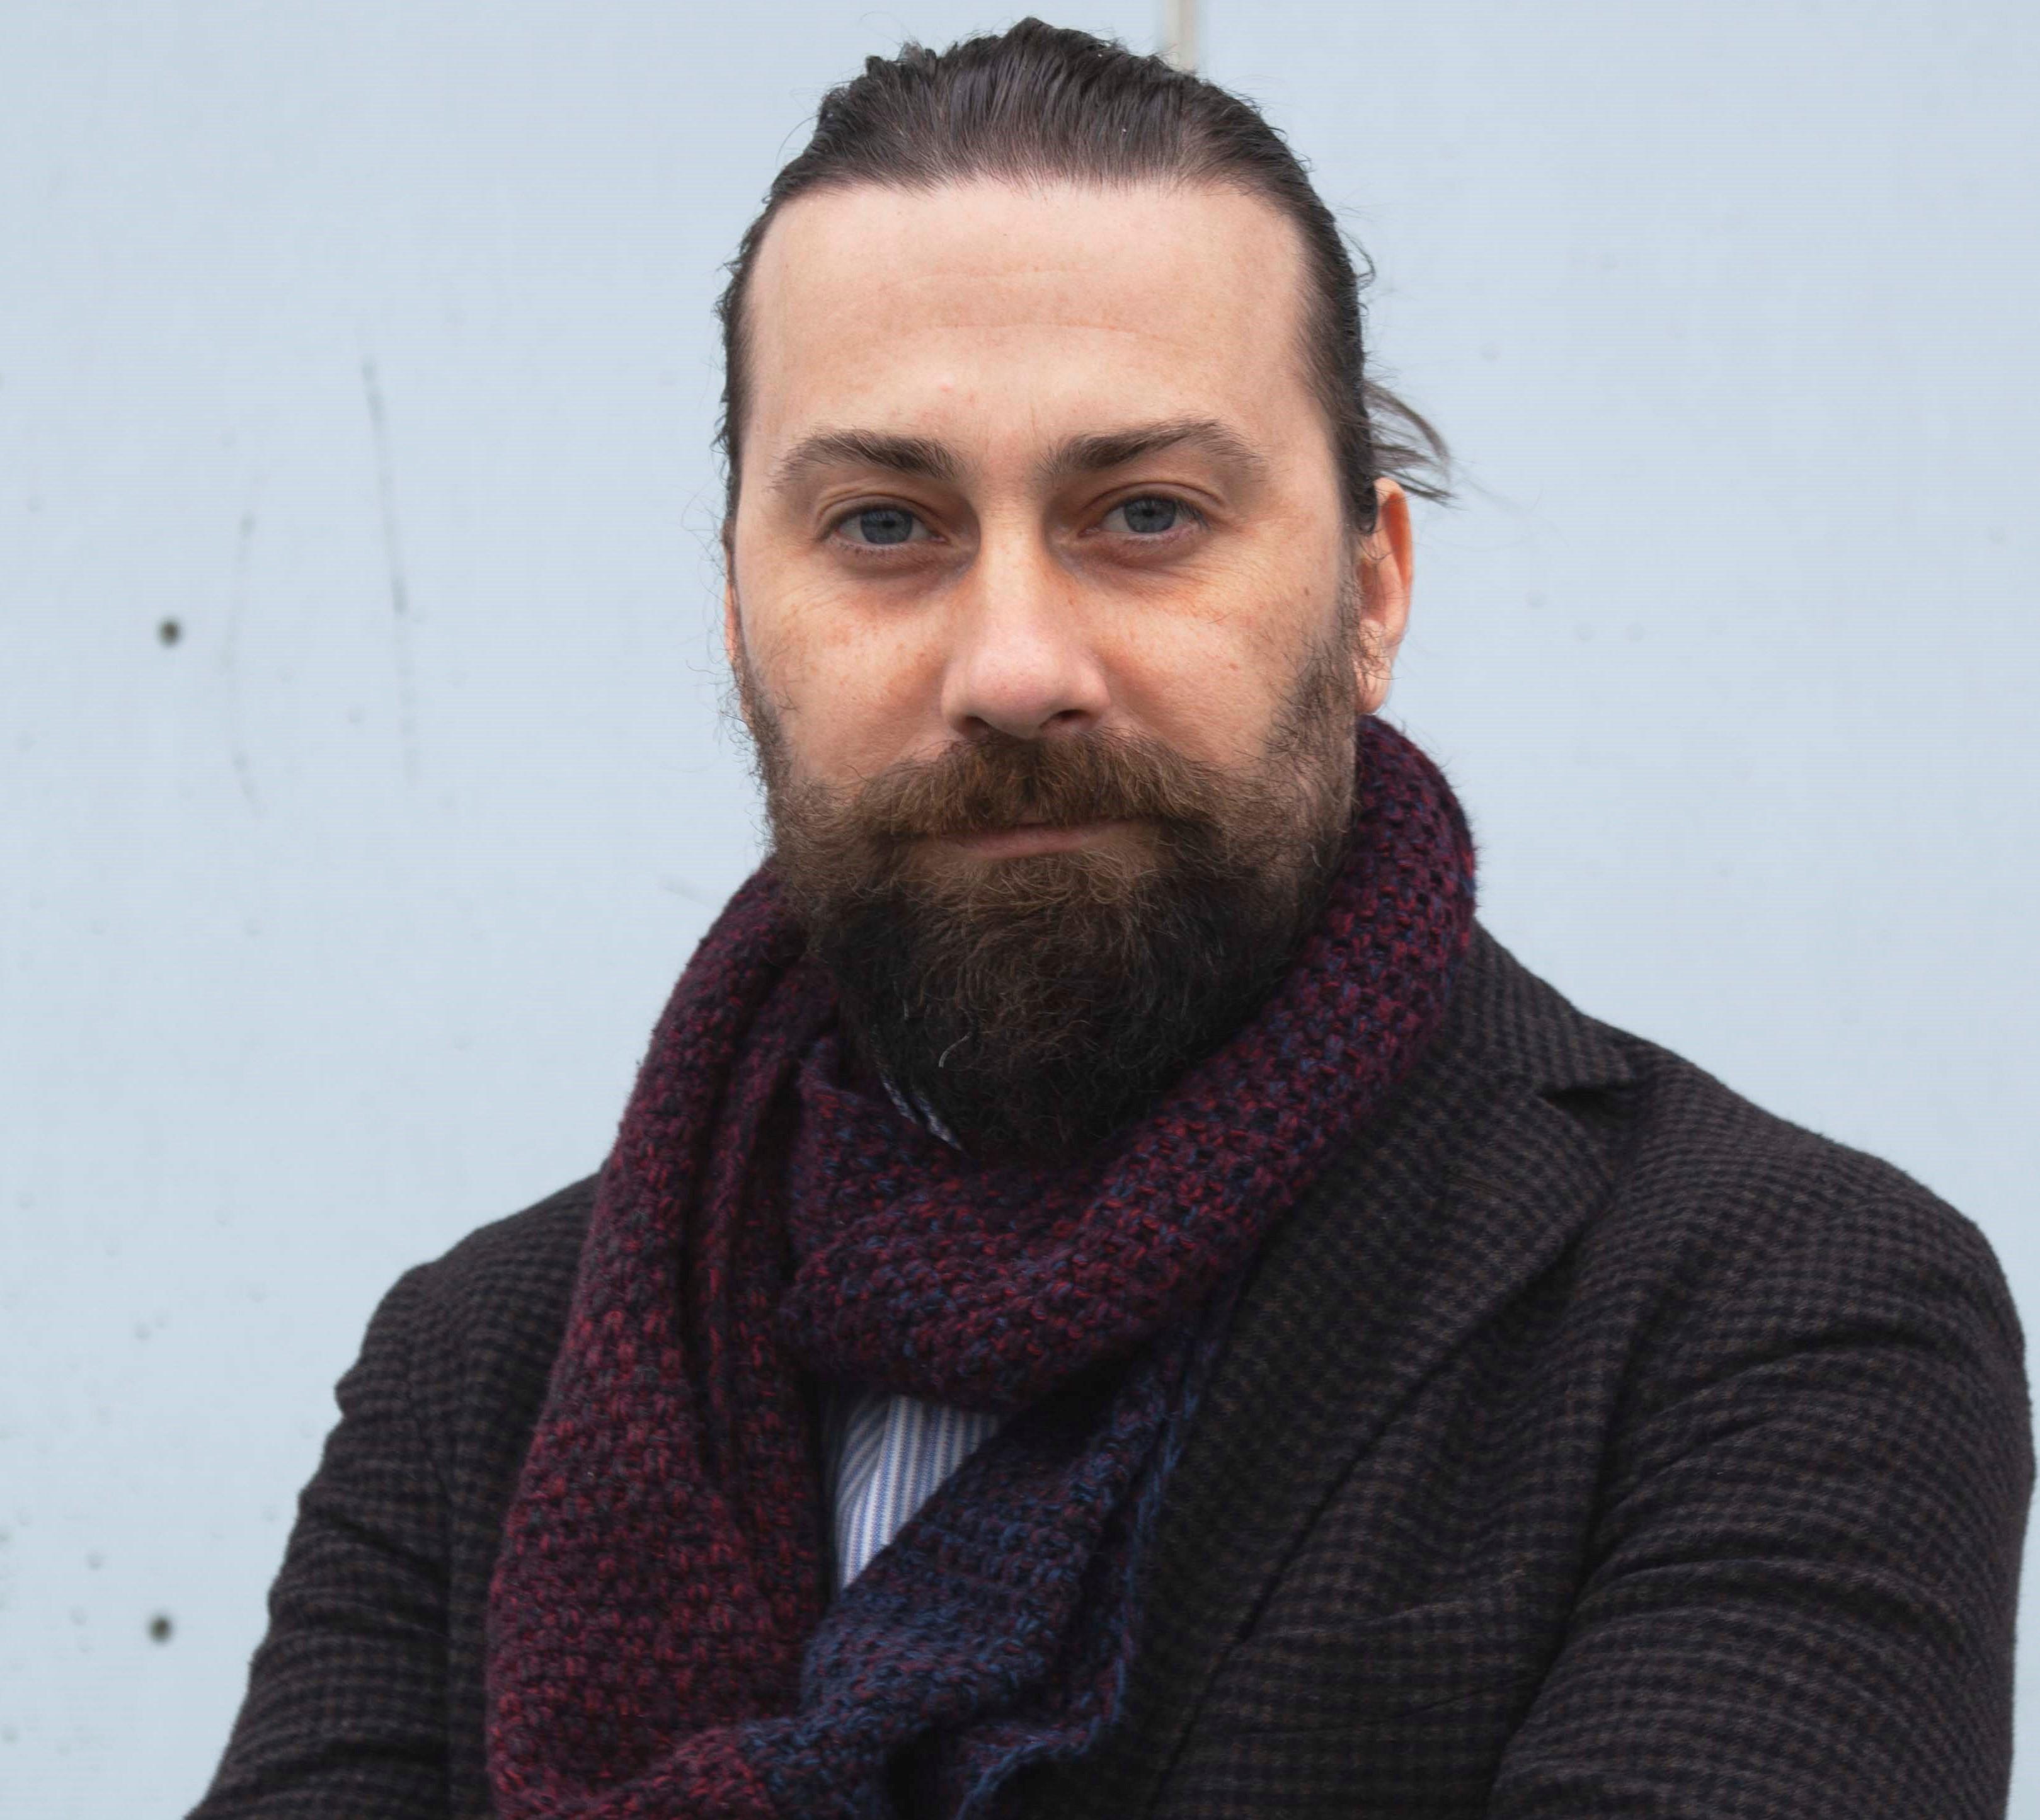 Arjel Trajani